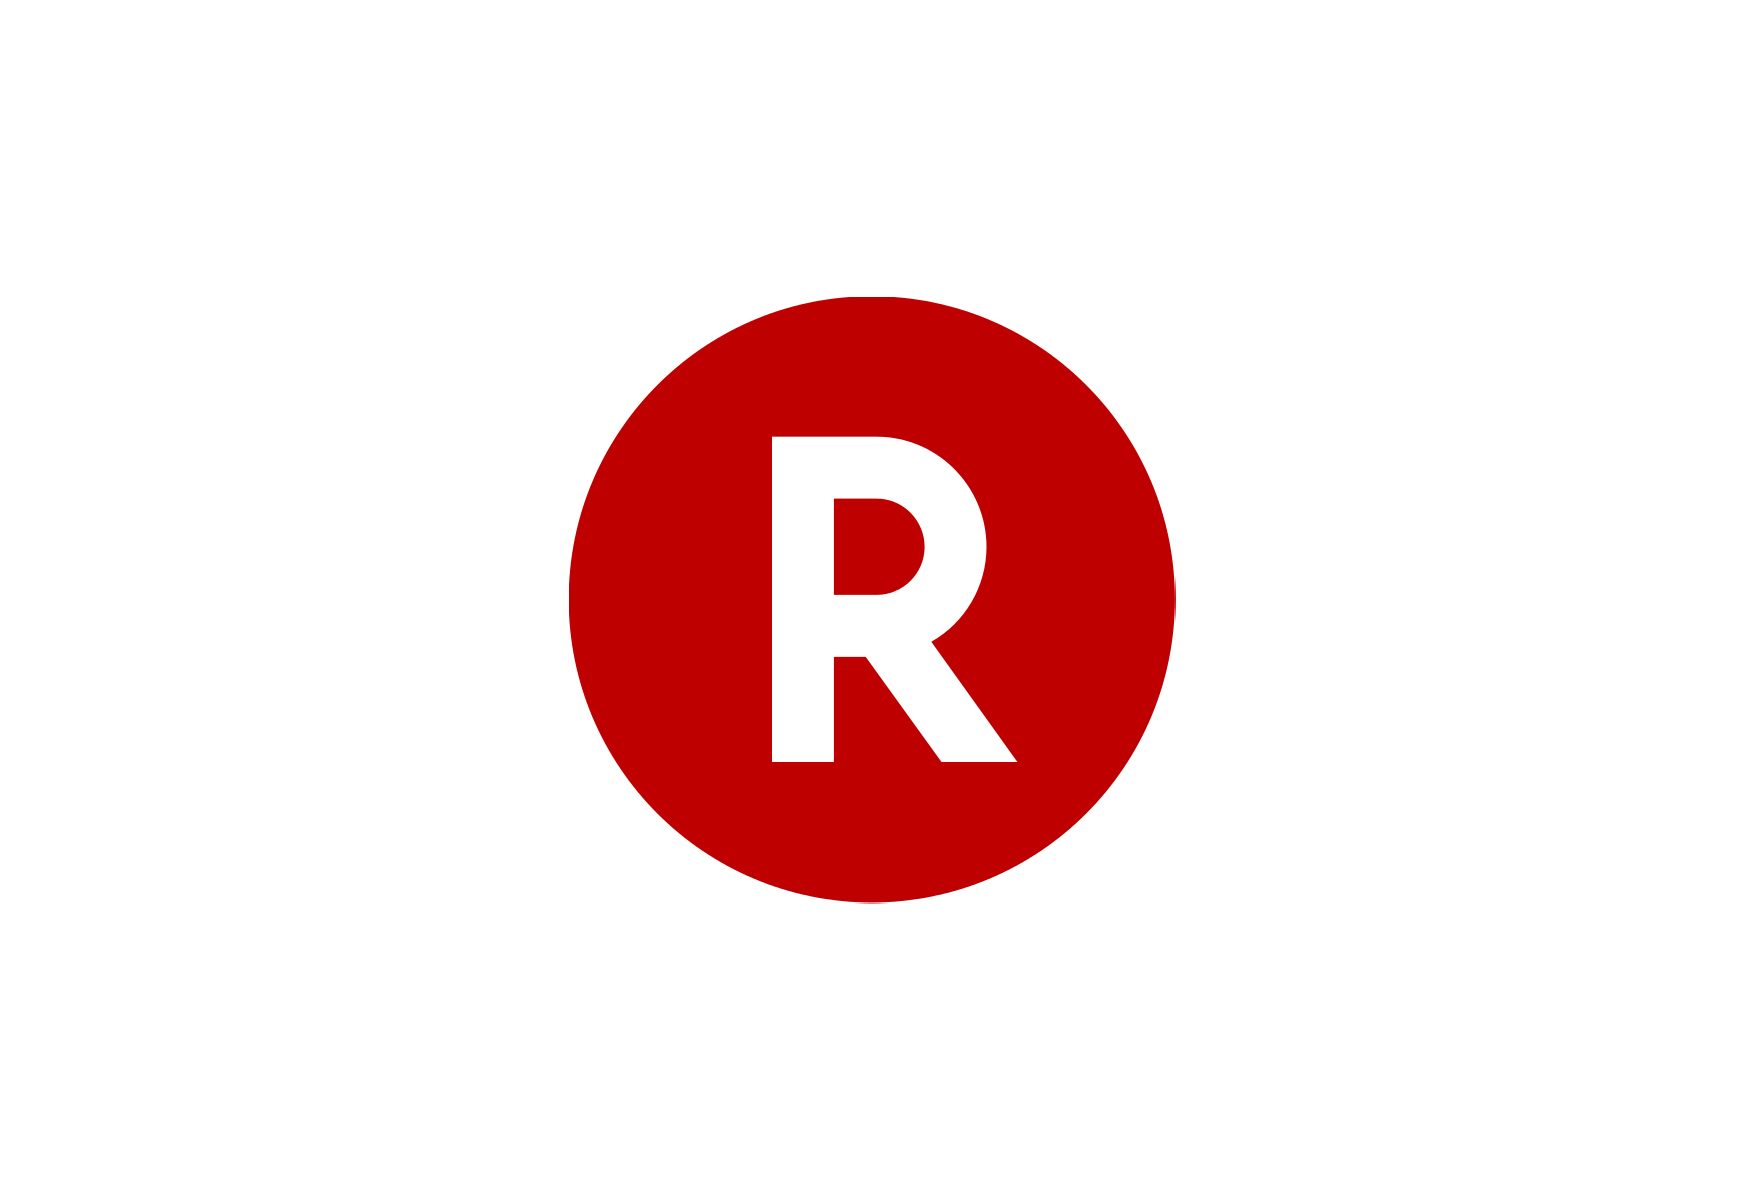 Rakuten logo.